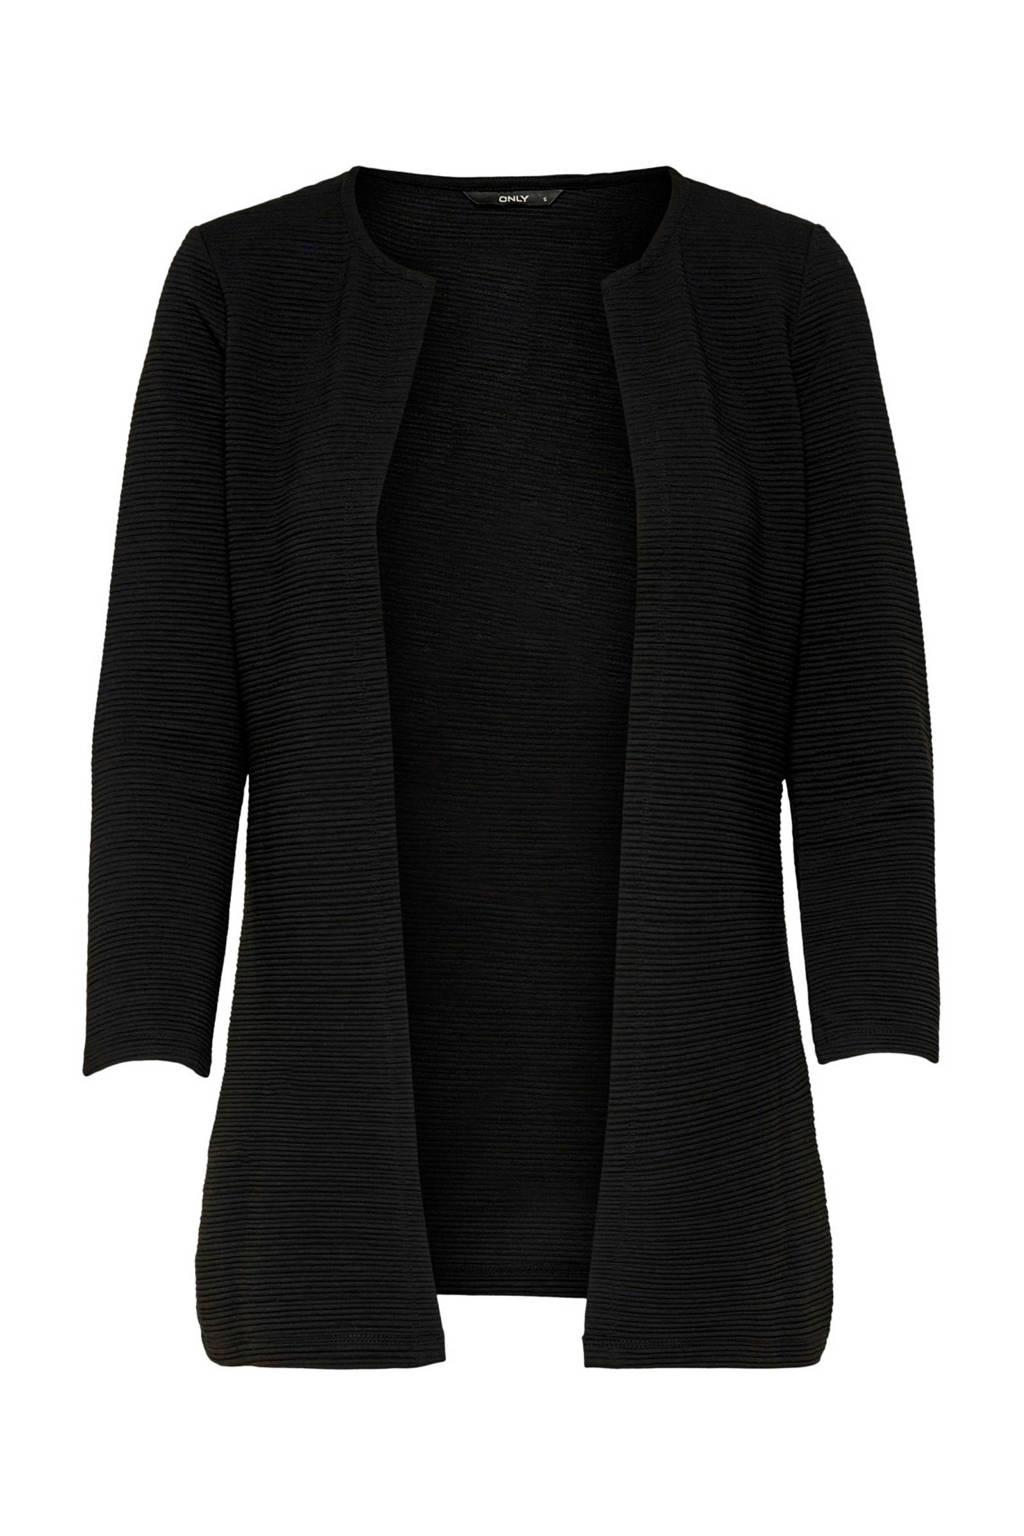 ONLY vest, Zwart